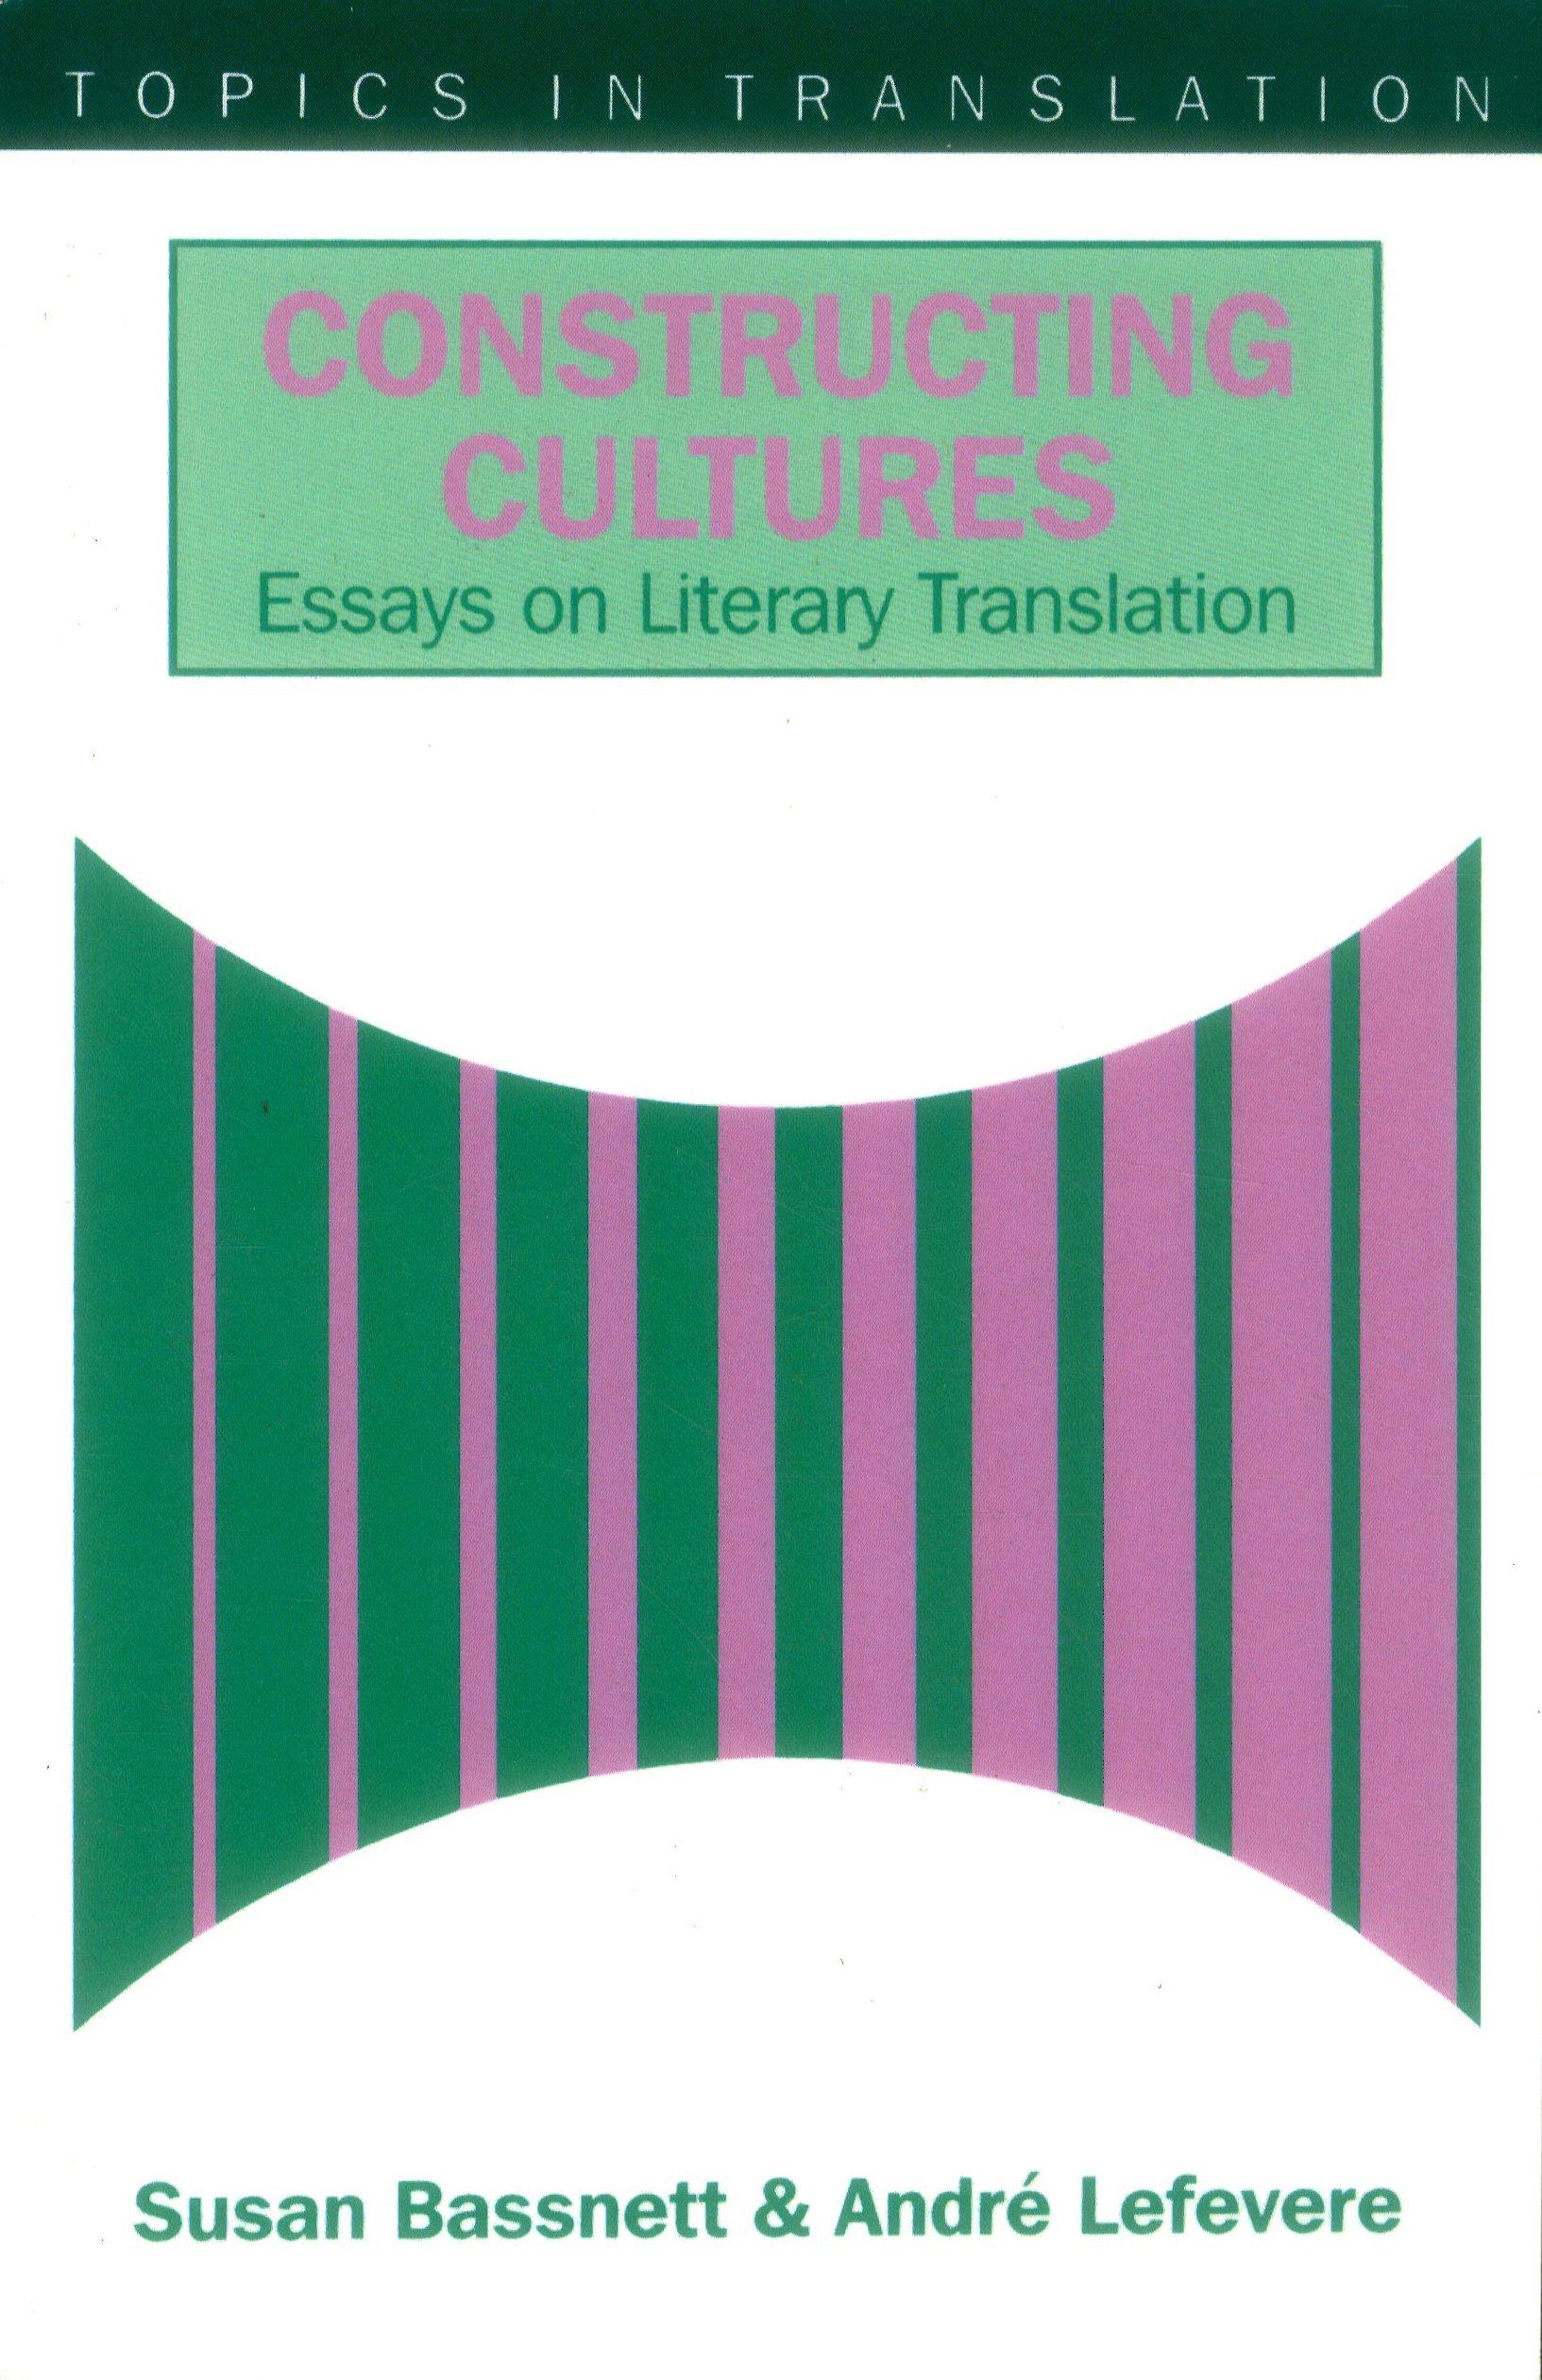 heart of darkness amazon it joseph conrad paul b armstrong constructing cultures essays on literary translation